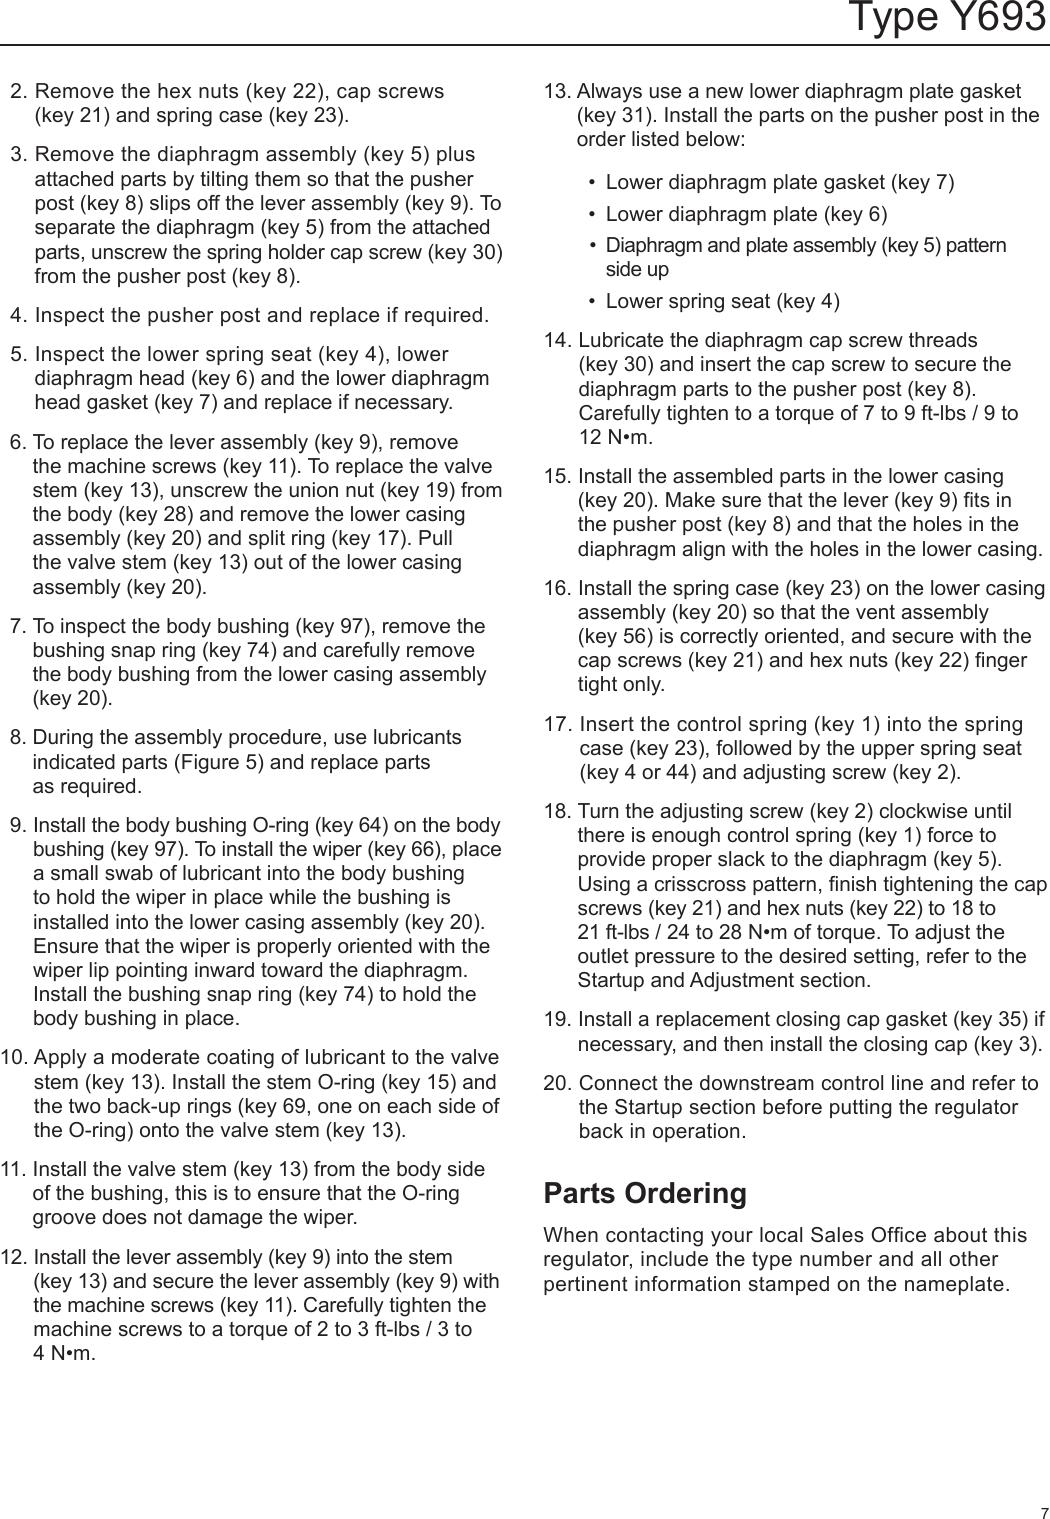 Emerson Type Y693 Gas Blanketing Regulator Instruction Manual